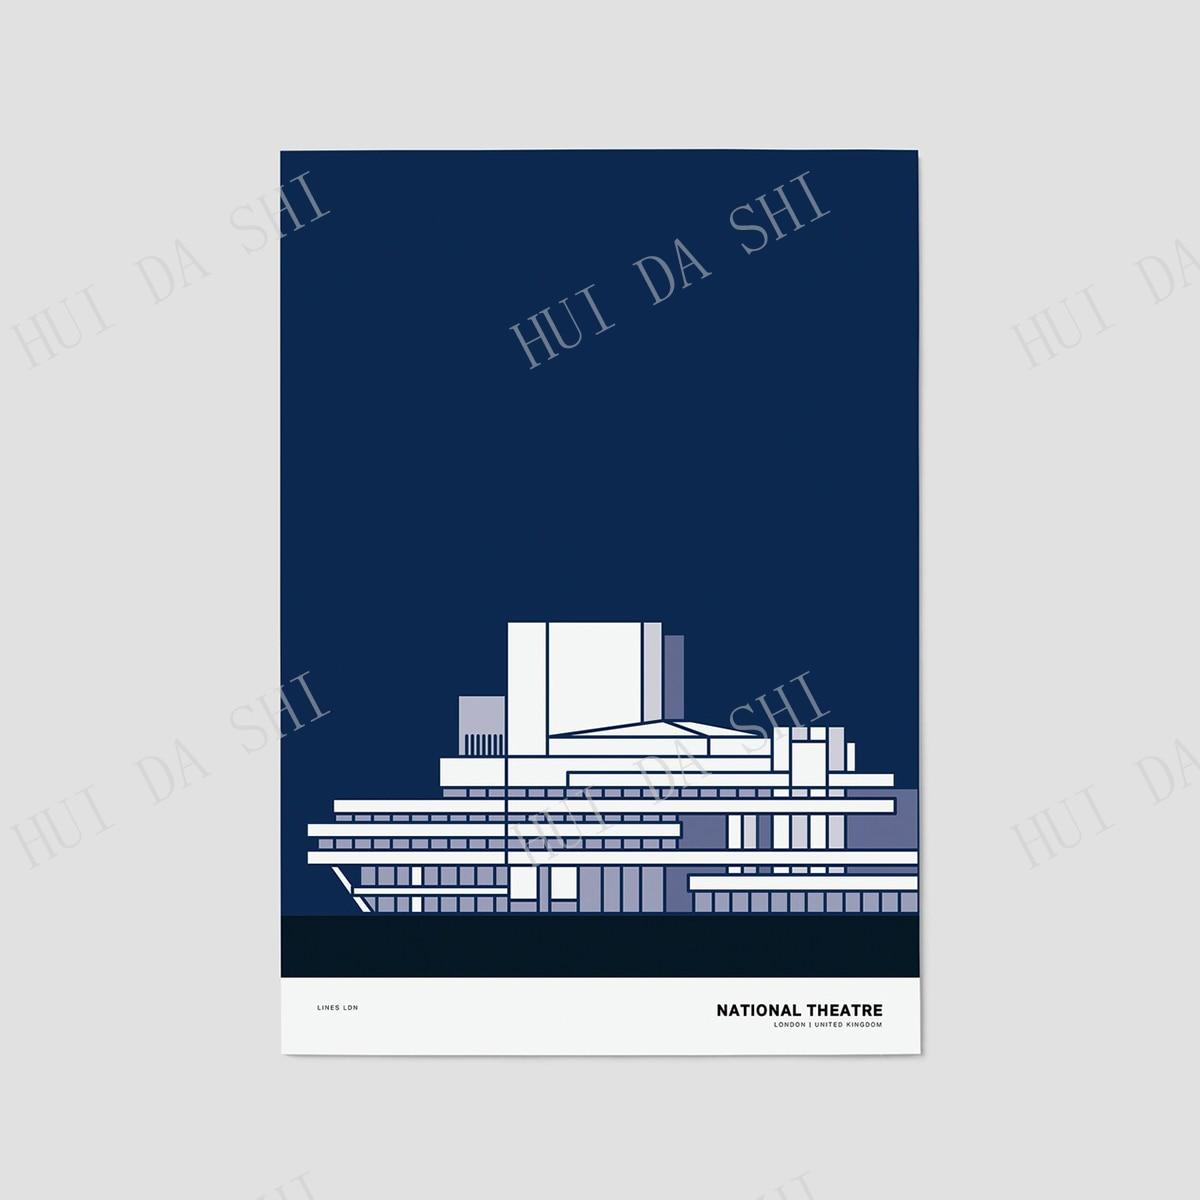 National Theatre, London Print   London Poster   London Illustration   London Architecture Print   London Skyline   London Gift